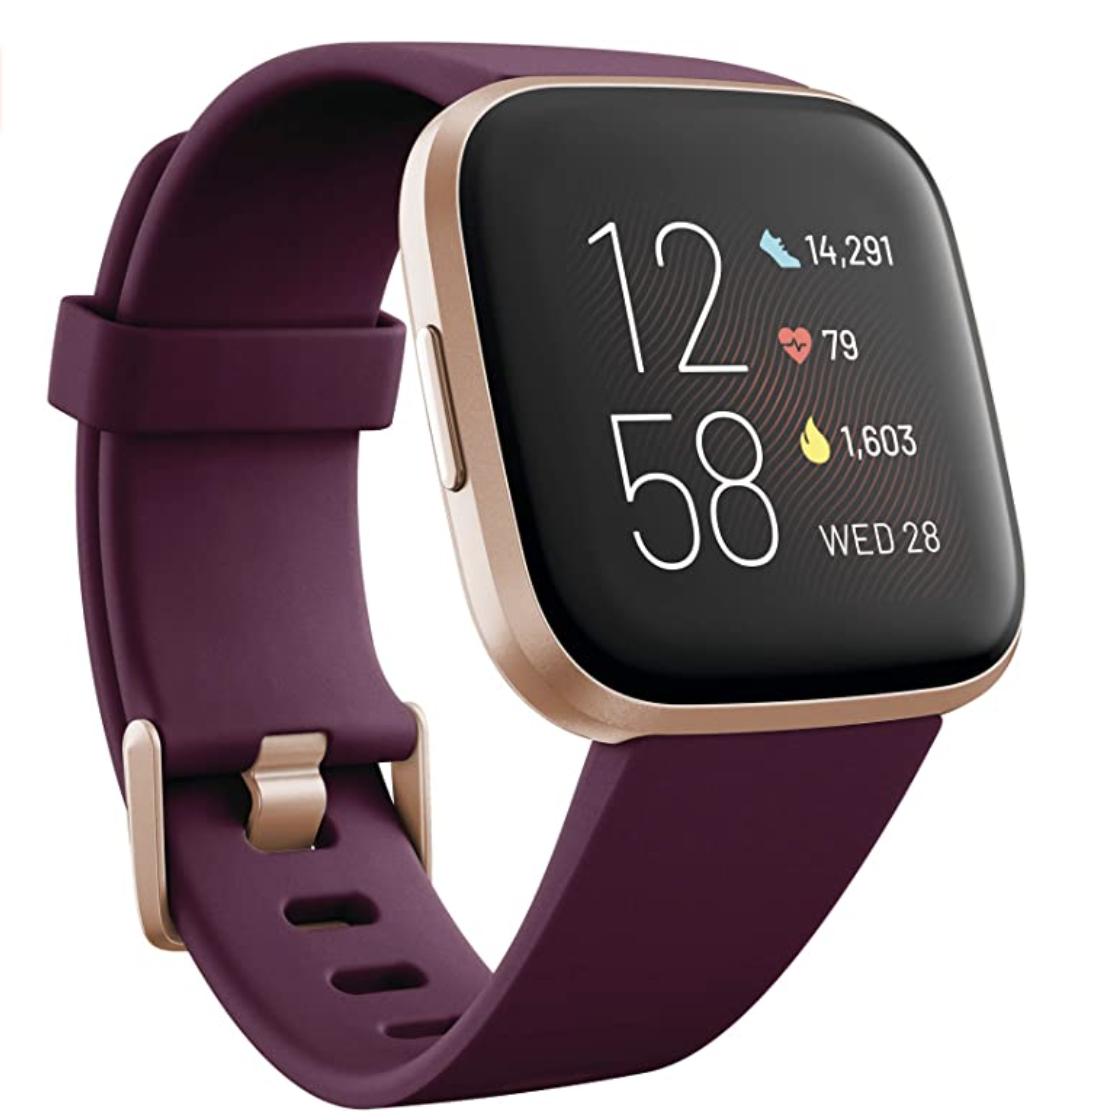 Wine-colored Fitbit Versa 2 Smartwatch